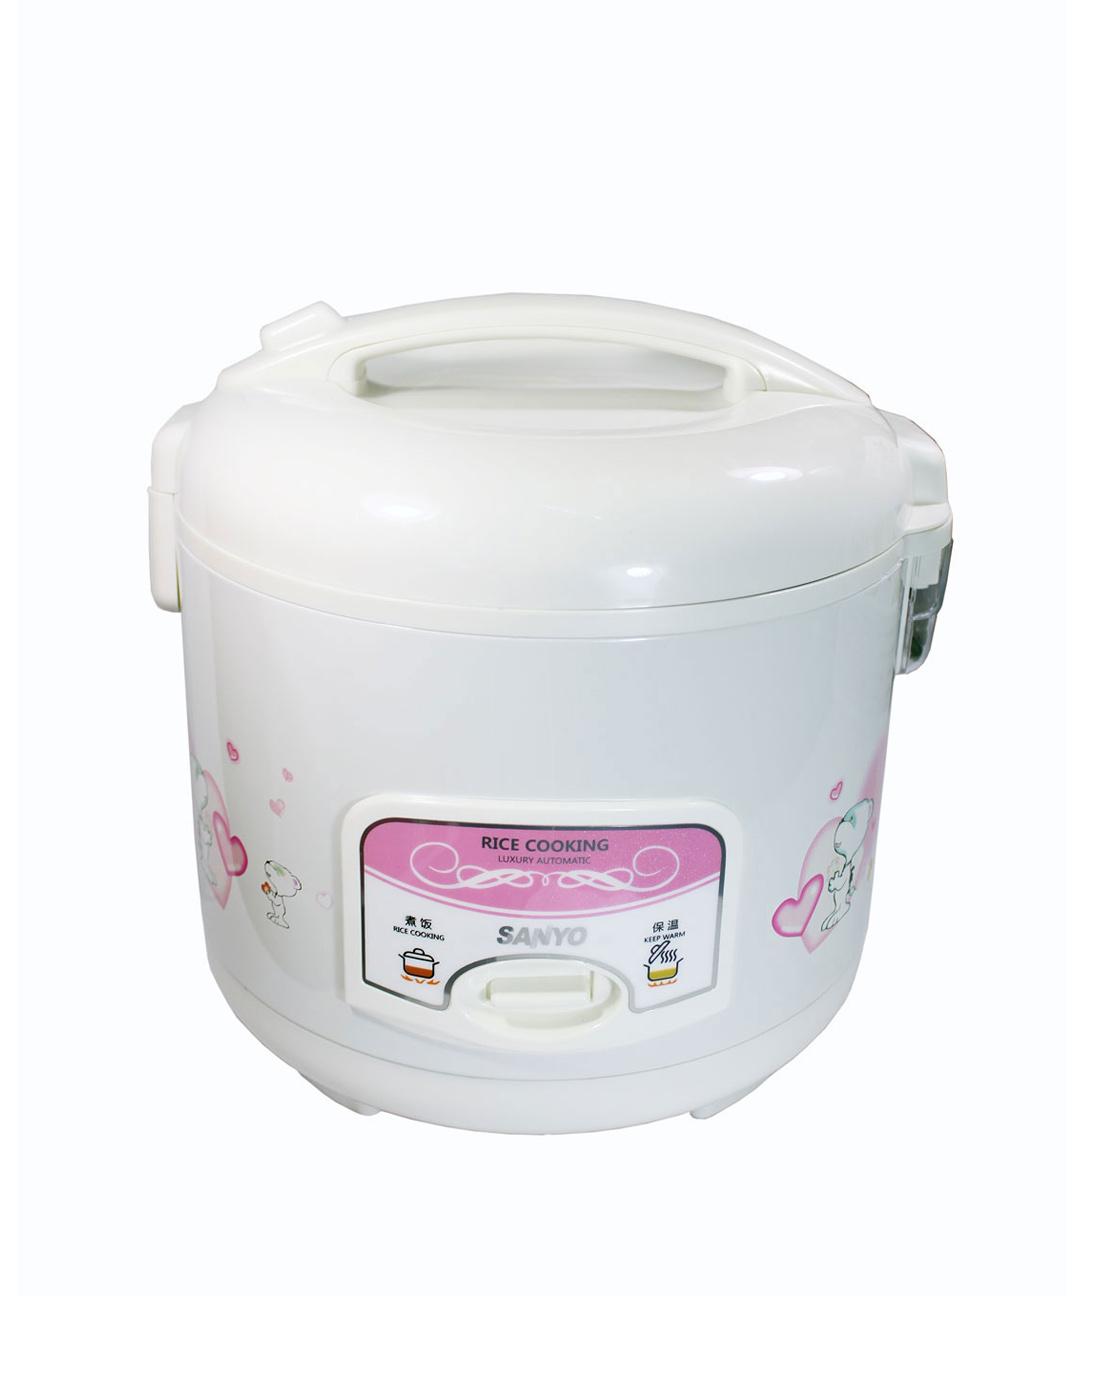 三洋sanyo&灿坤eupa电器微压烹饪白色自动电饭煲4lecj